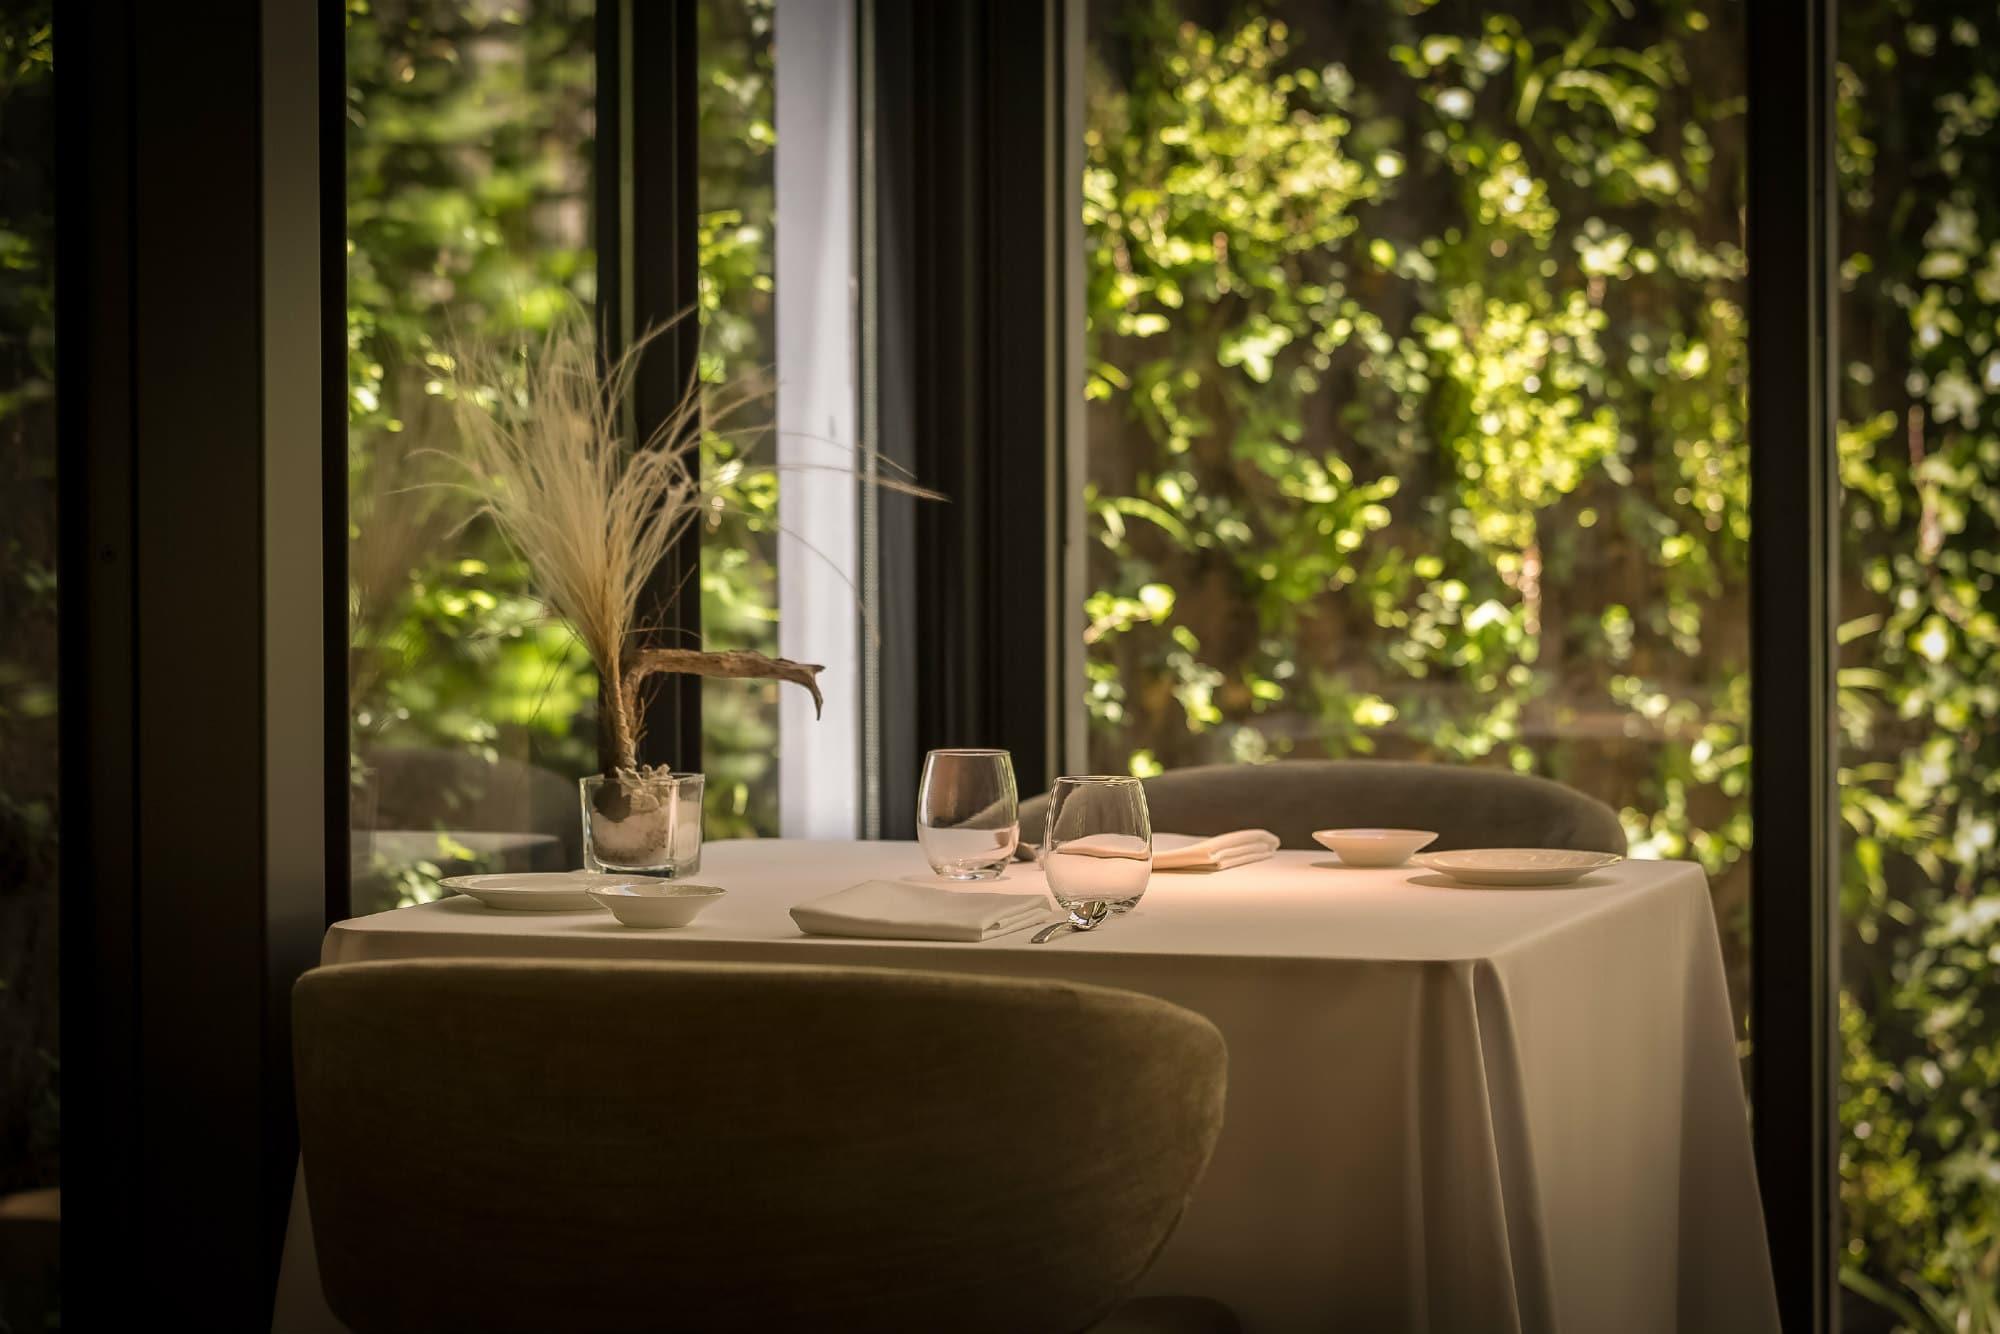 Xerta Restaurant Barcelona restaurante Ohla Eixample hotel contactoFran Lopez